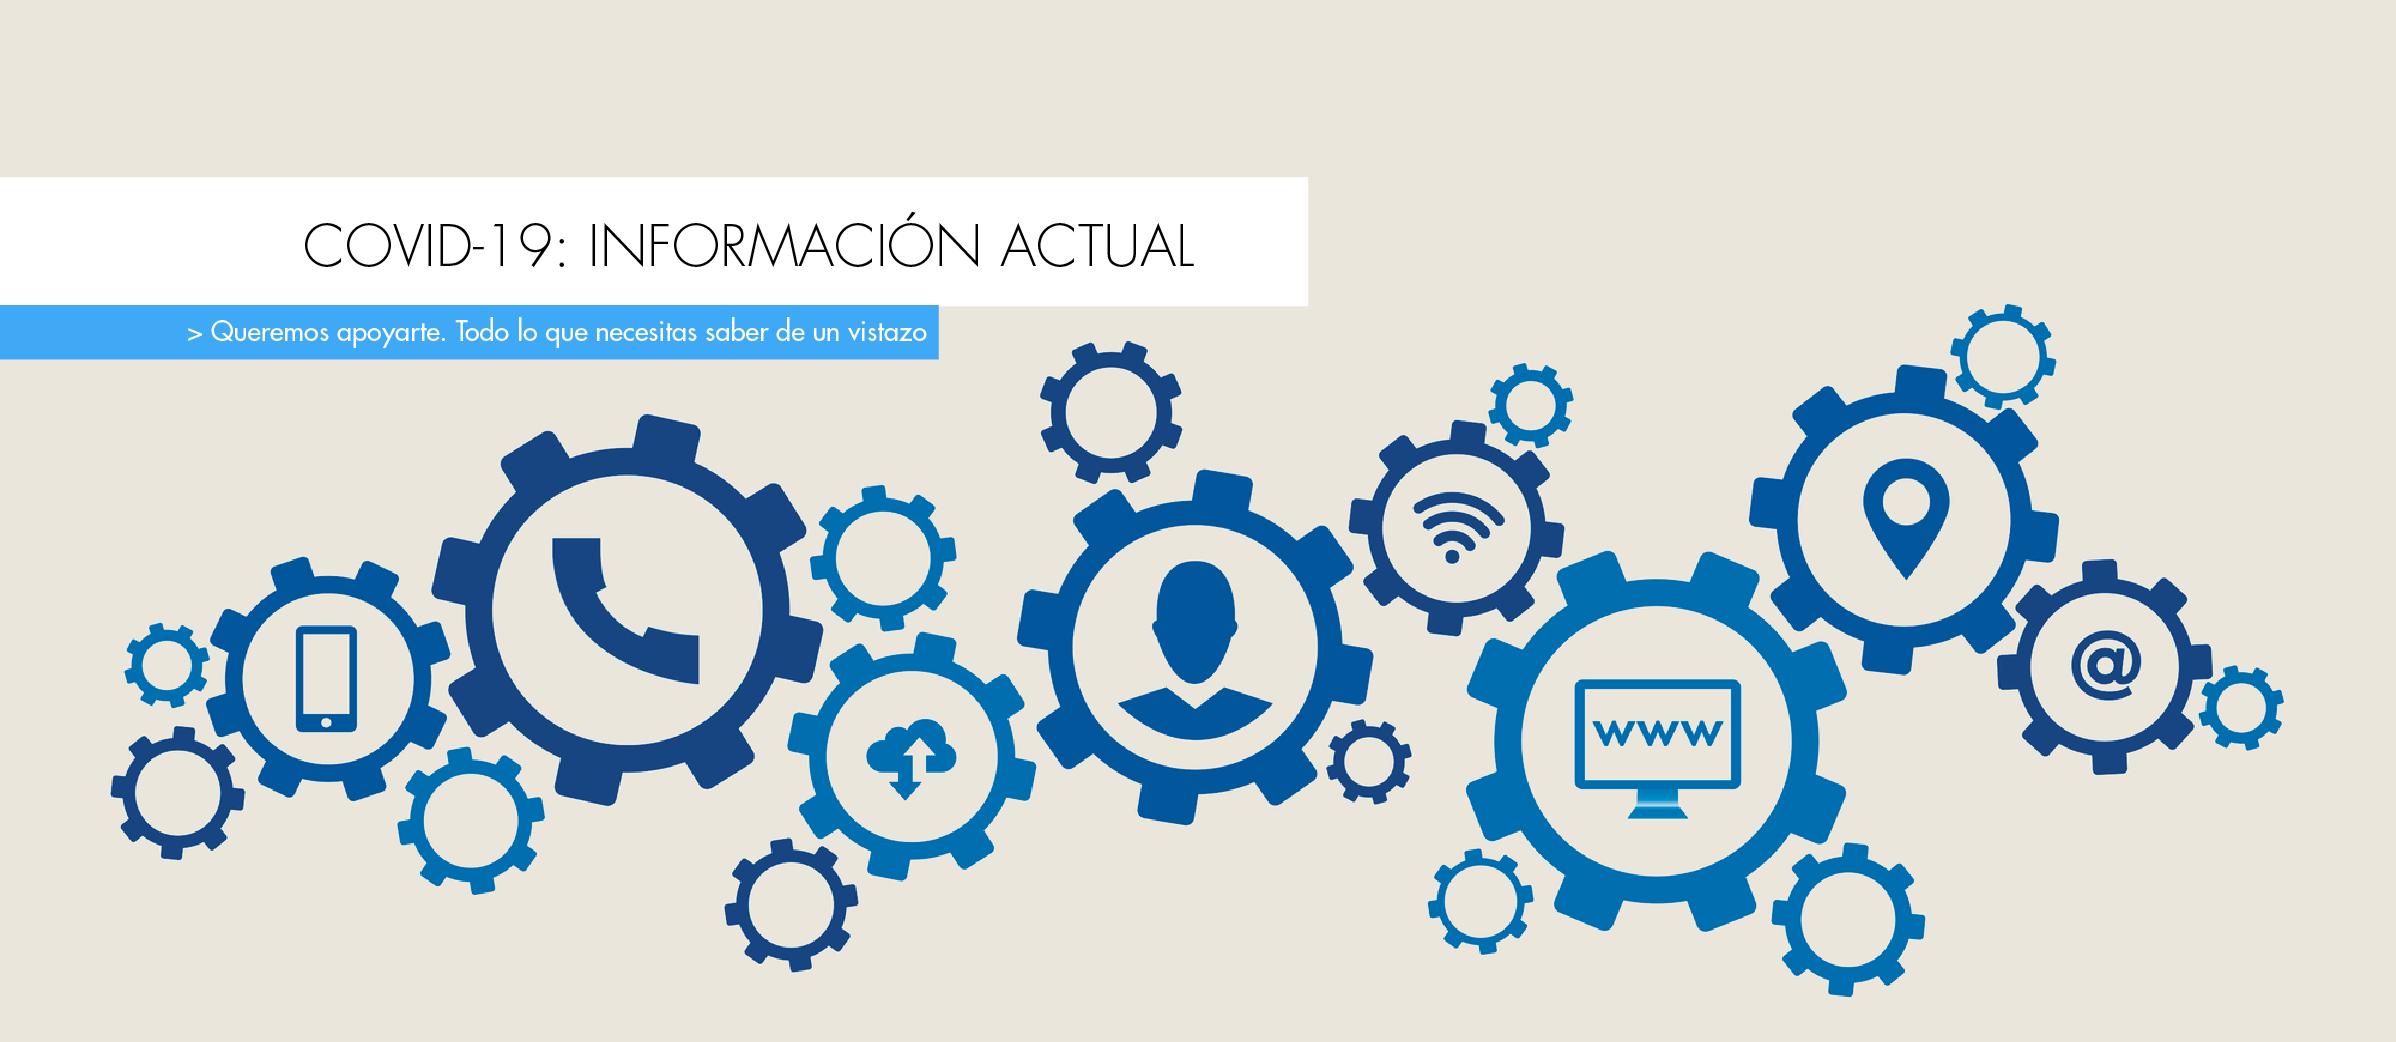 https://www.knauf.es/sites/default/files/revslider/image/Cabecera%20covid_Mesa%20de%20trabajo%201_Mesa%20de%20trabajo%201.png